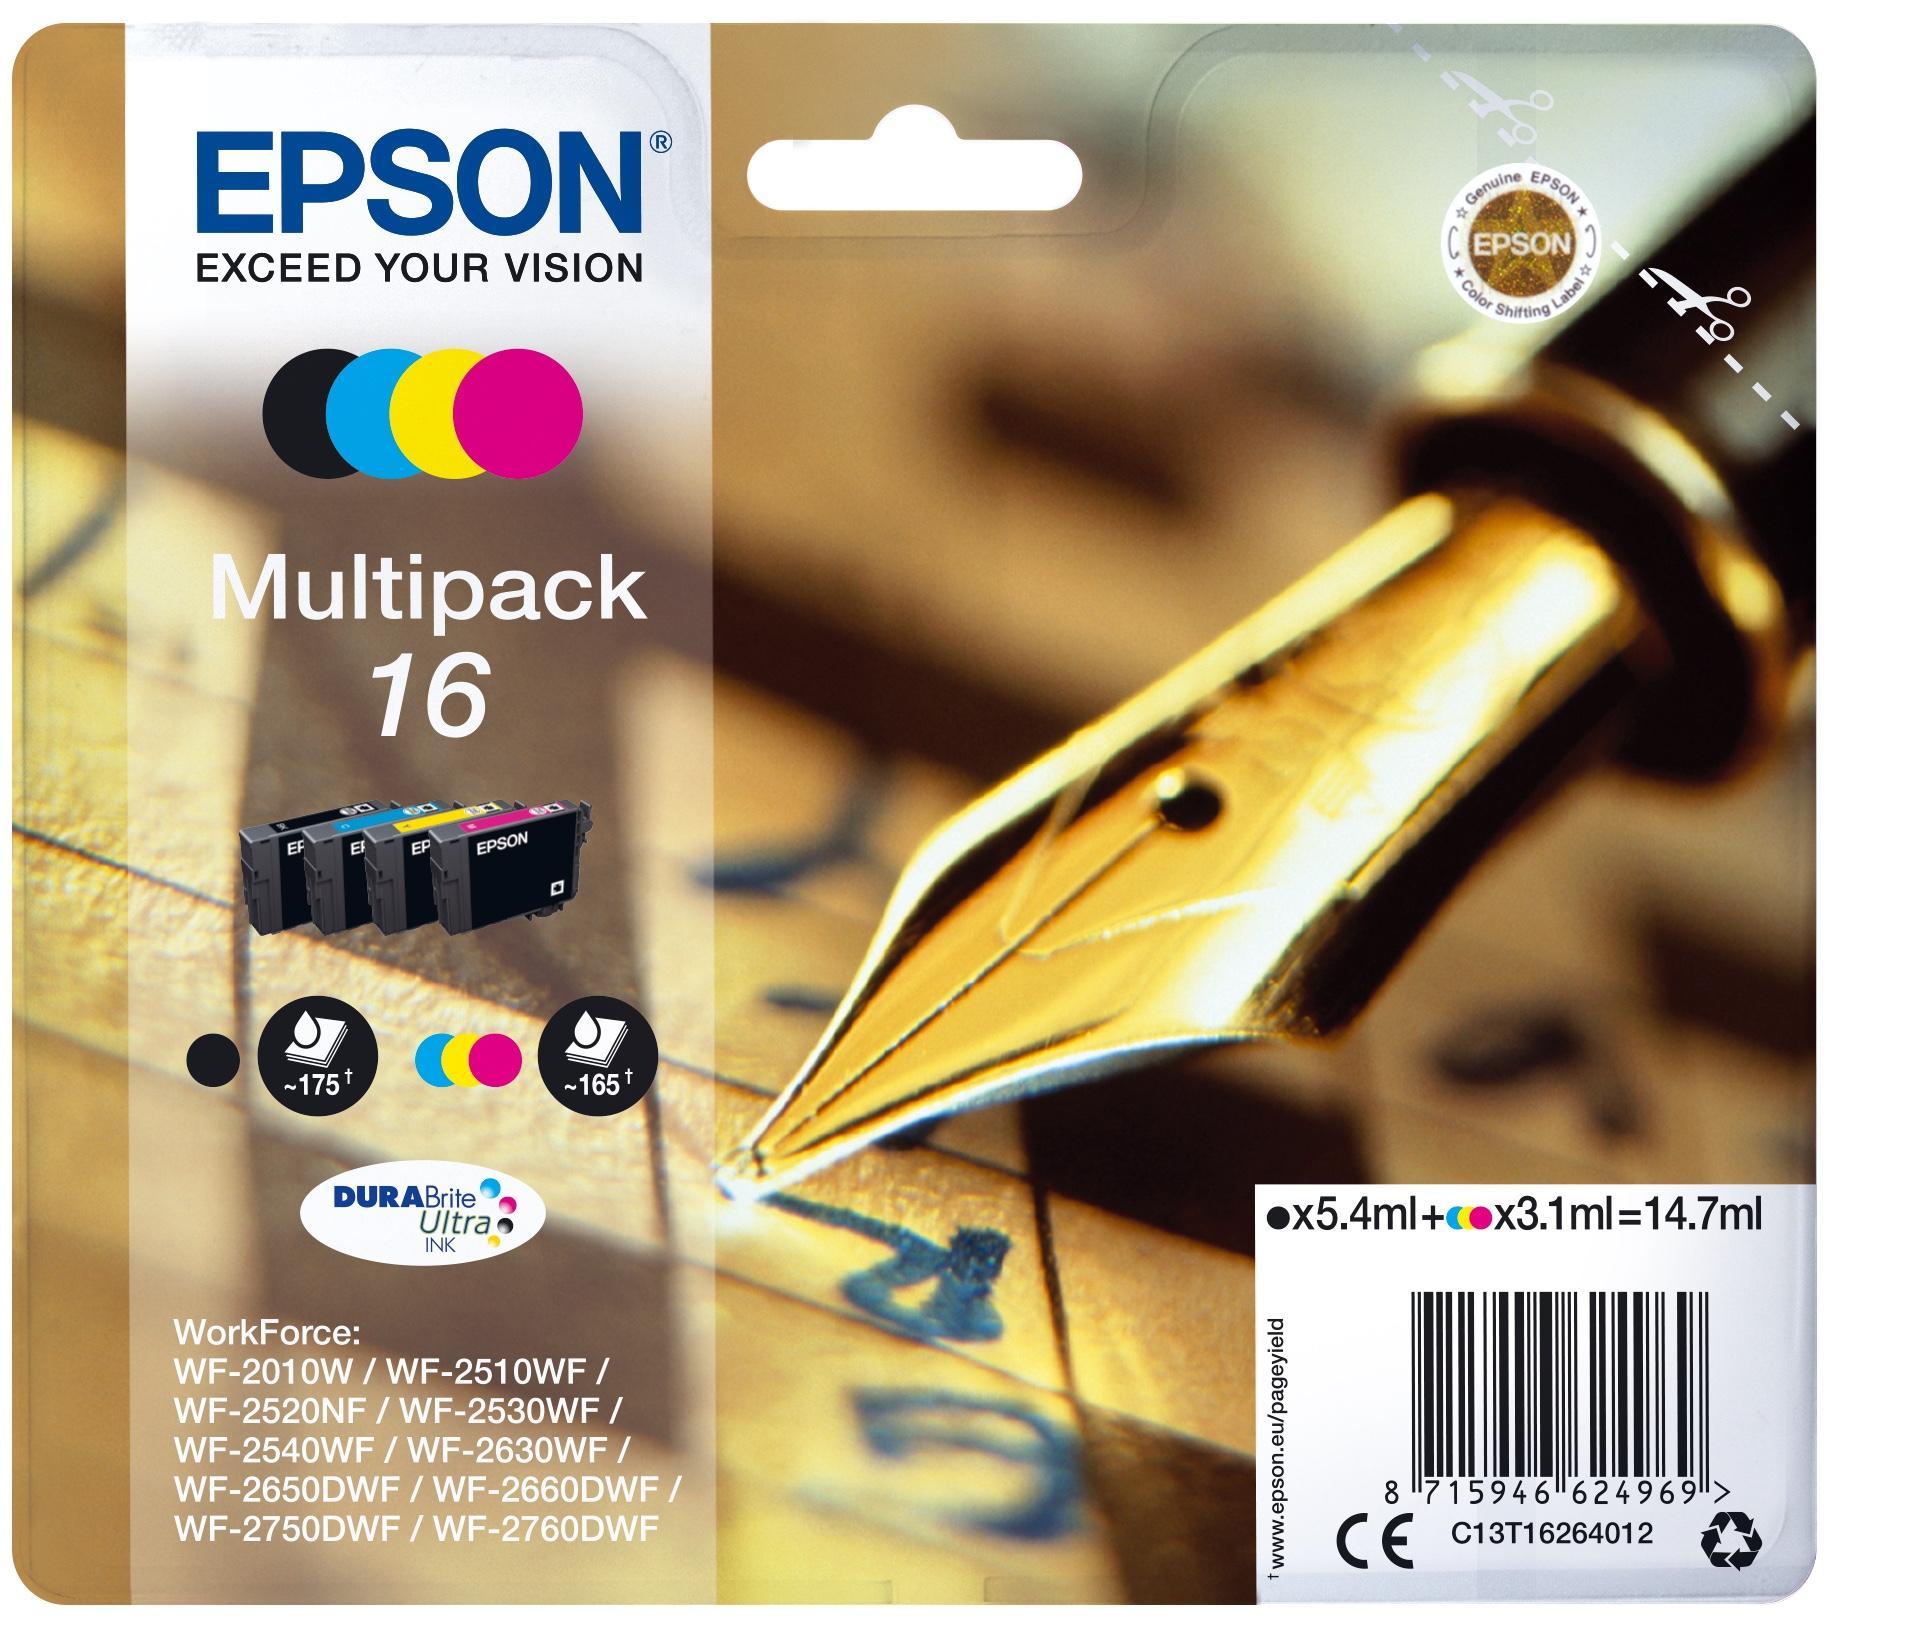 Epson Pen and crossword Multipack Penna e cruciverba 4 colori Inchiostri DURABrite Ultra 16